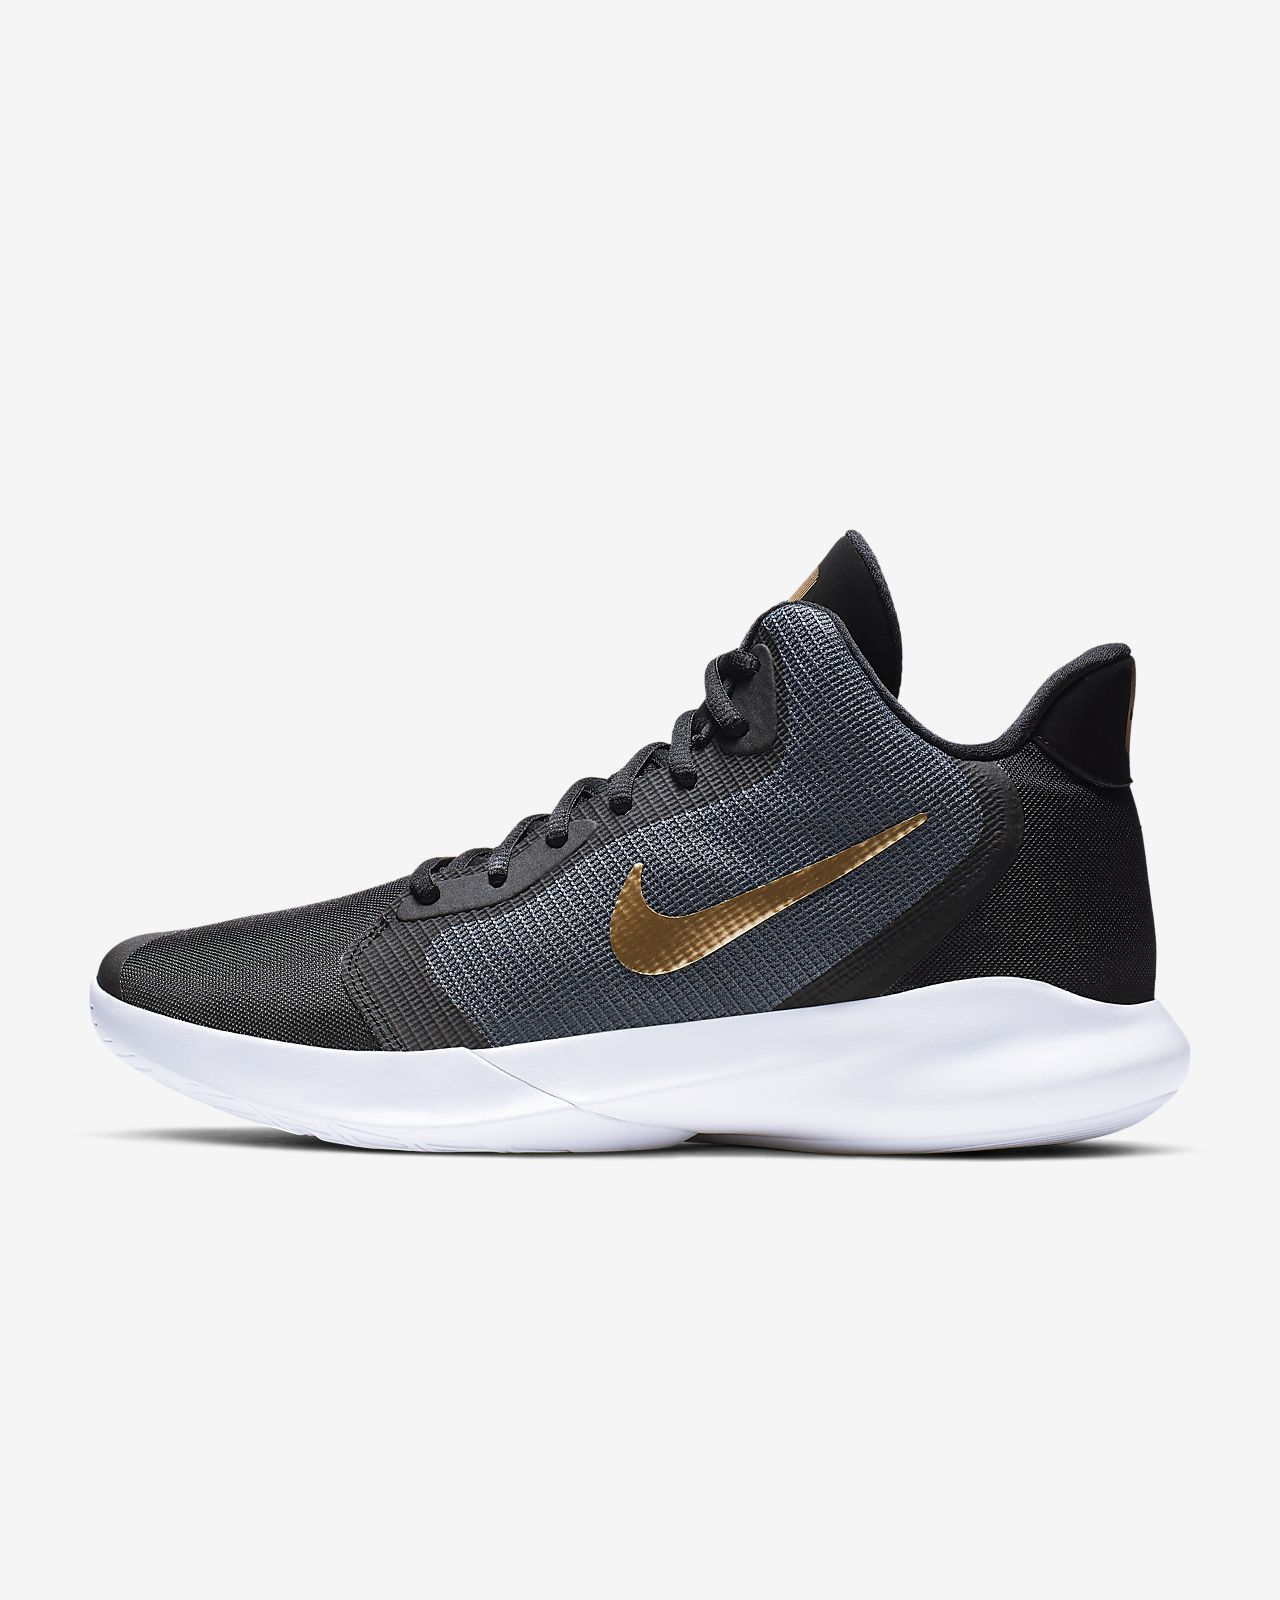 8d8f1d61902 Low Resolution Nike Precision III Basketball Shoe Nike Precision III  Basketball Shoe